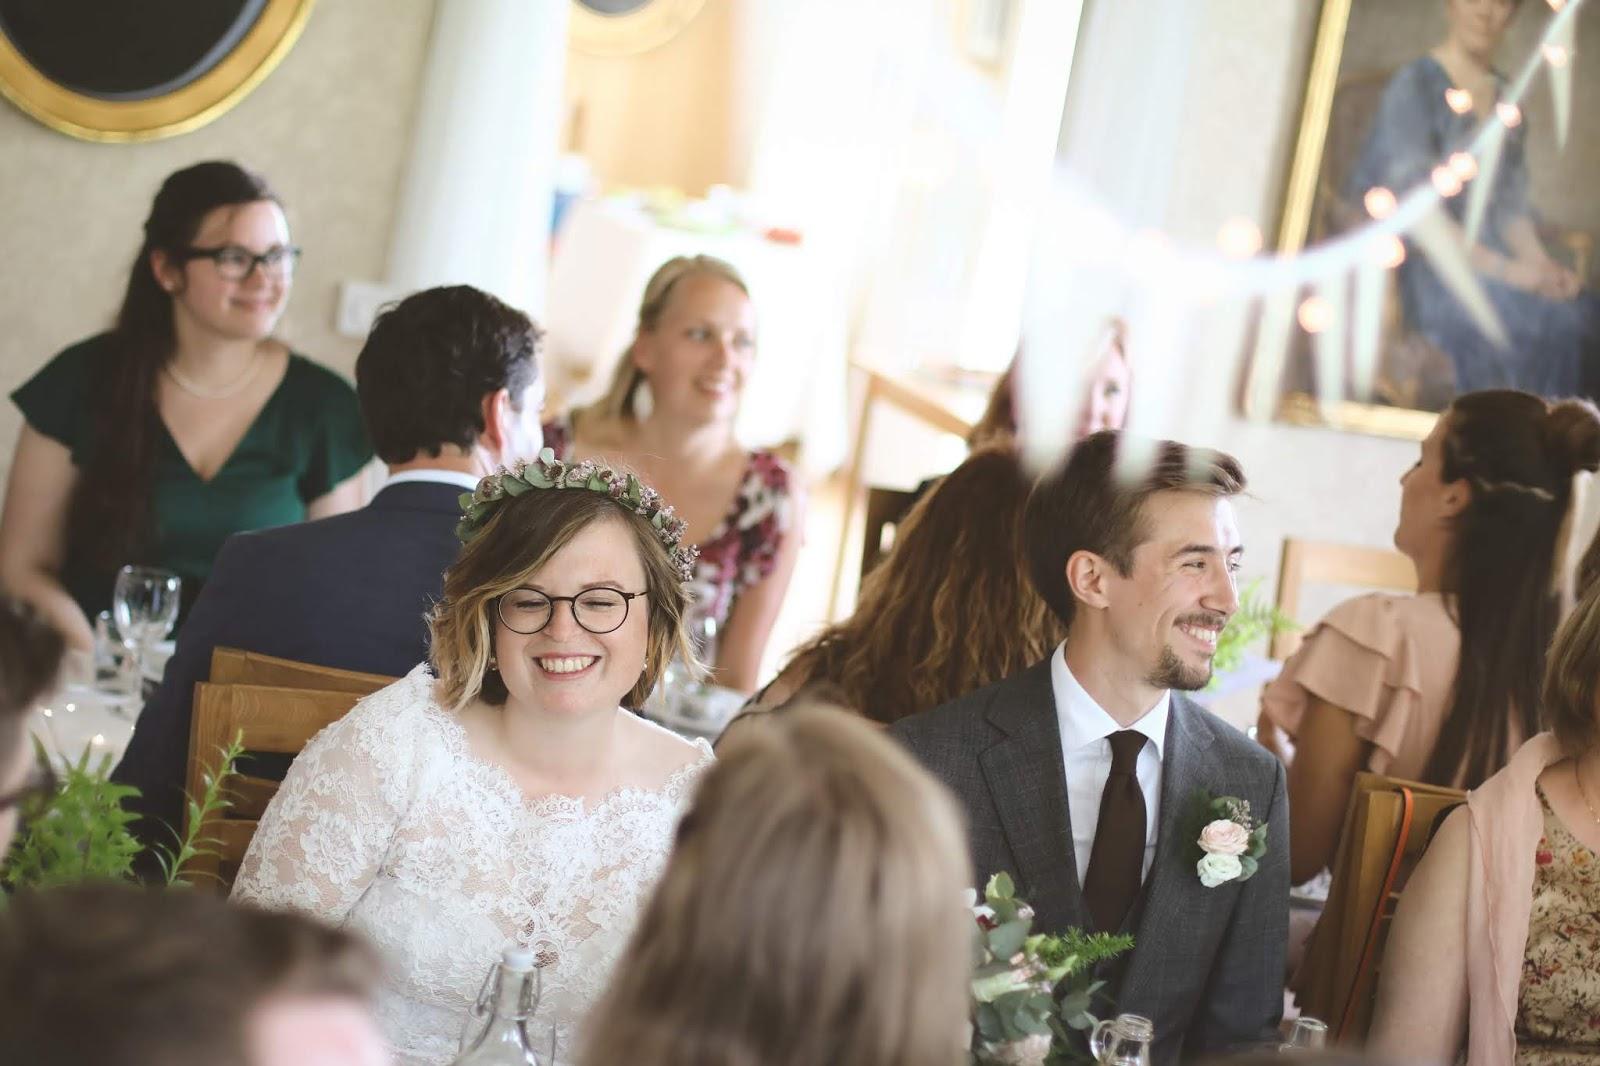 bröllopsfotograf Stockholm, fotograf Härnösand, fotograf Höga kusten, wedding photography, bröllop, fotograf Maria-Thérèse Sommar, Villa Fridhem